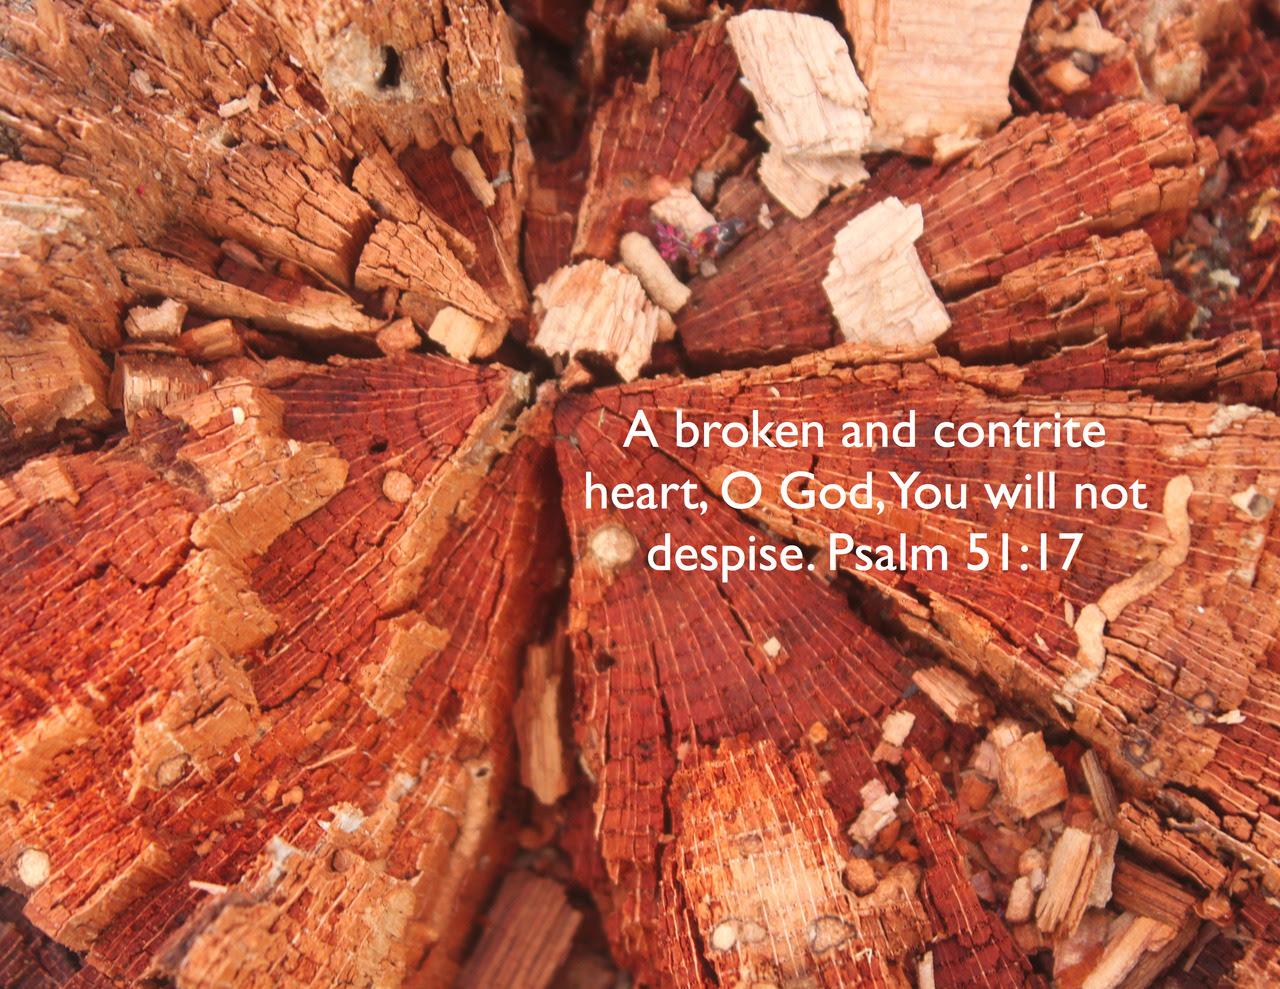 http://24.media.tumblr.com/tumblr_mdenkdktLG1rszo8ao1_1280.jpg